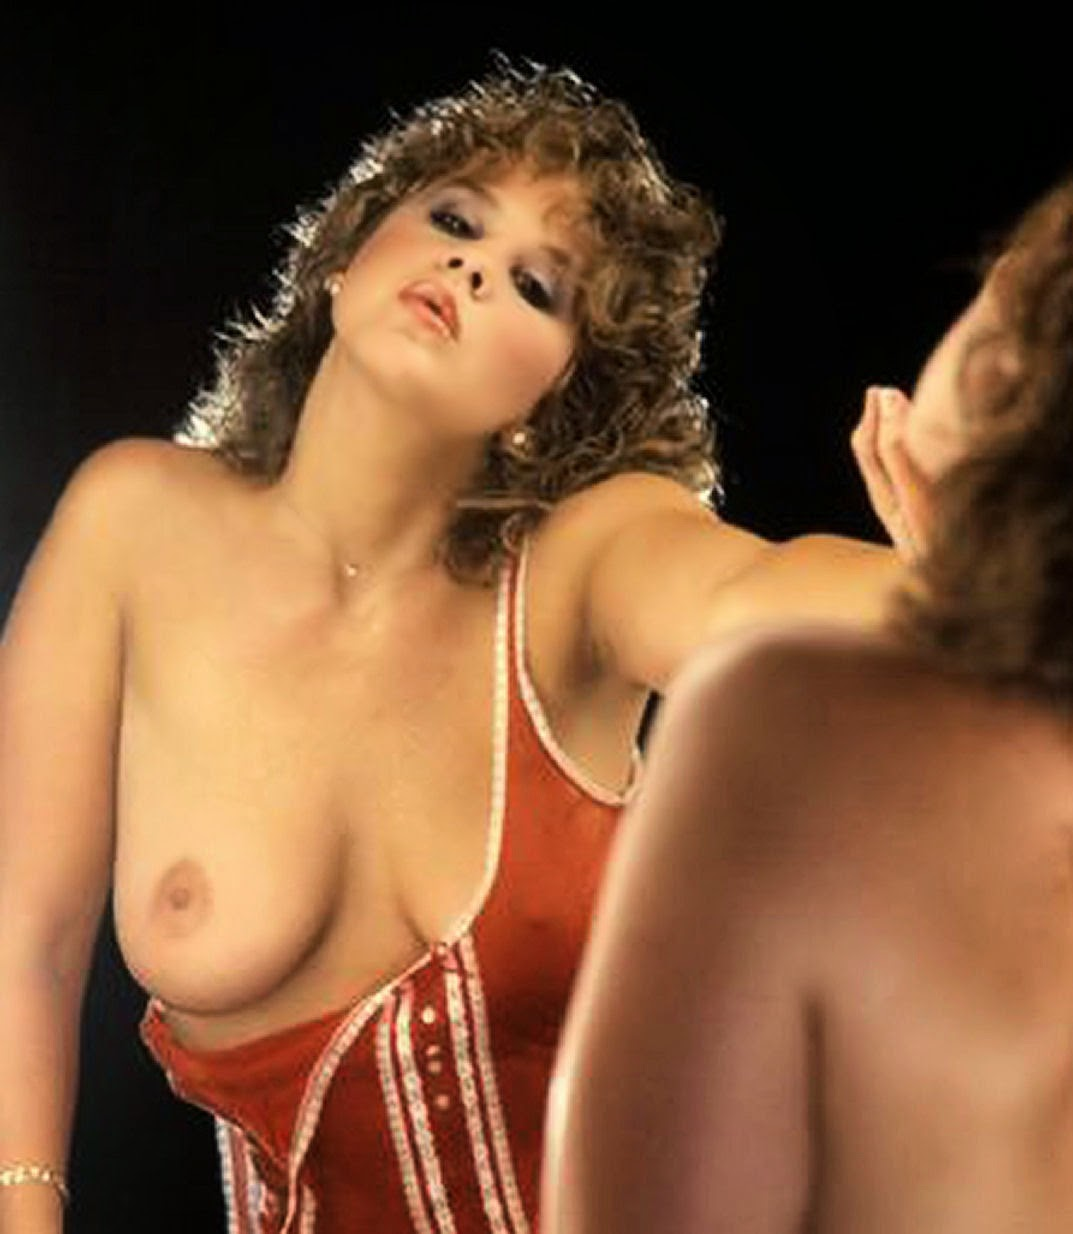 eroticheskie-foto-lindi-brava